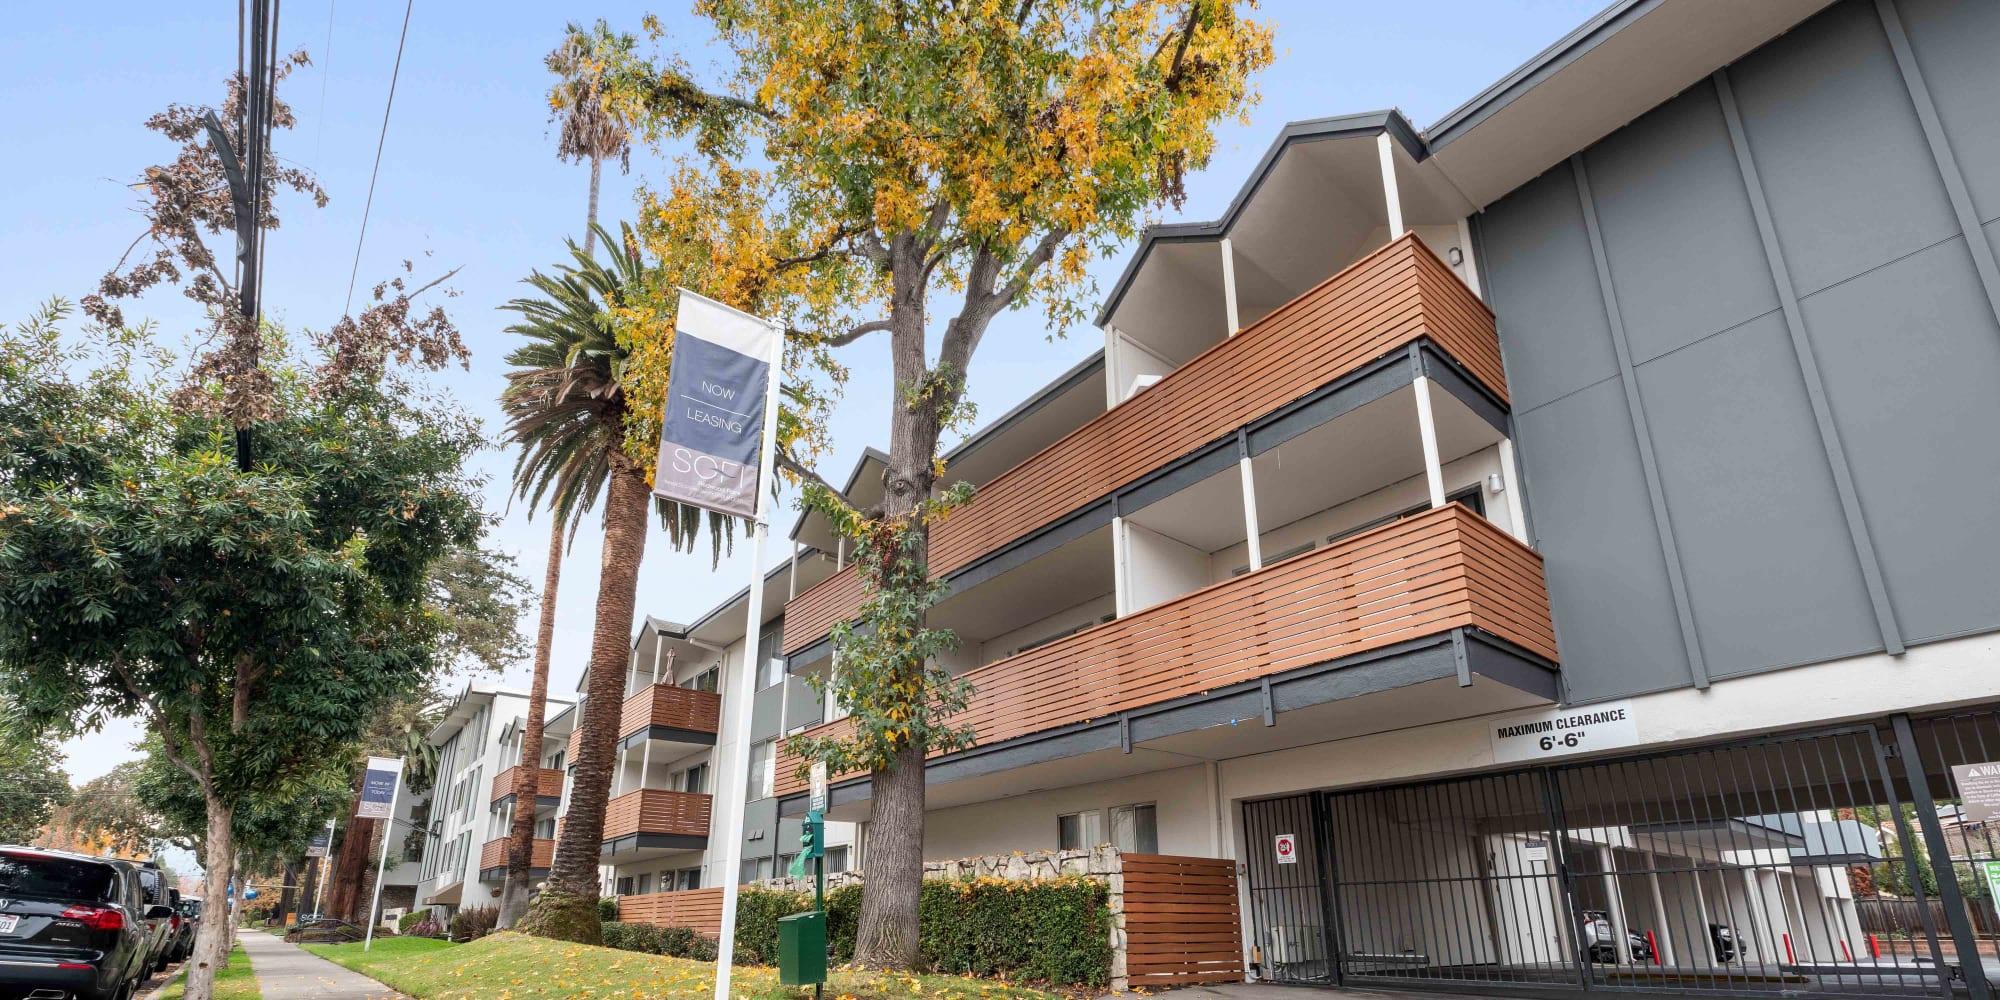 Apartments at Sofi Redwood Park in Redwood City, California